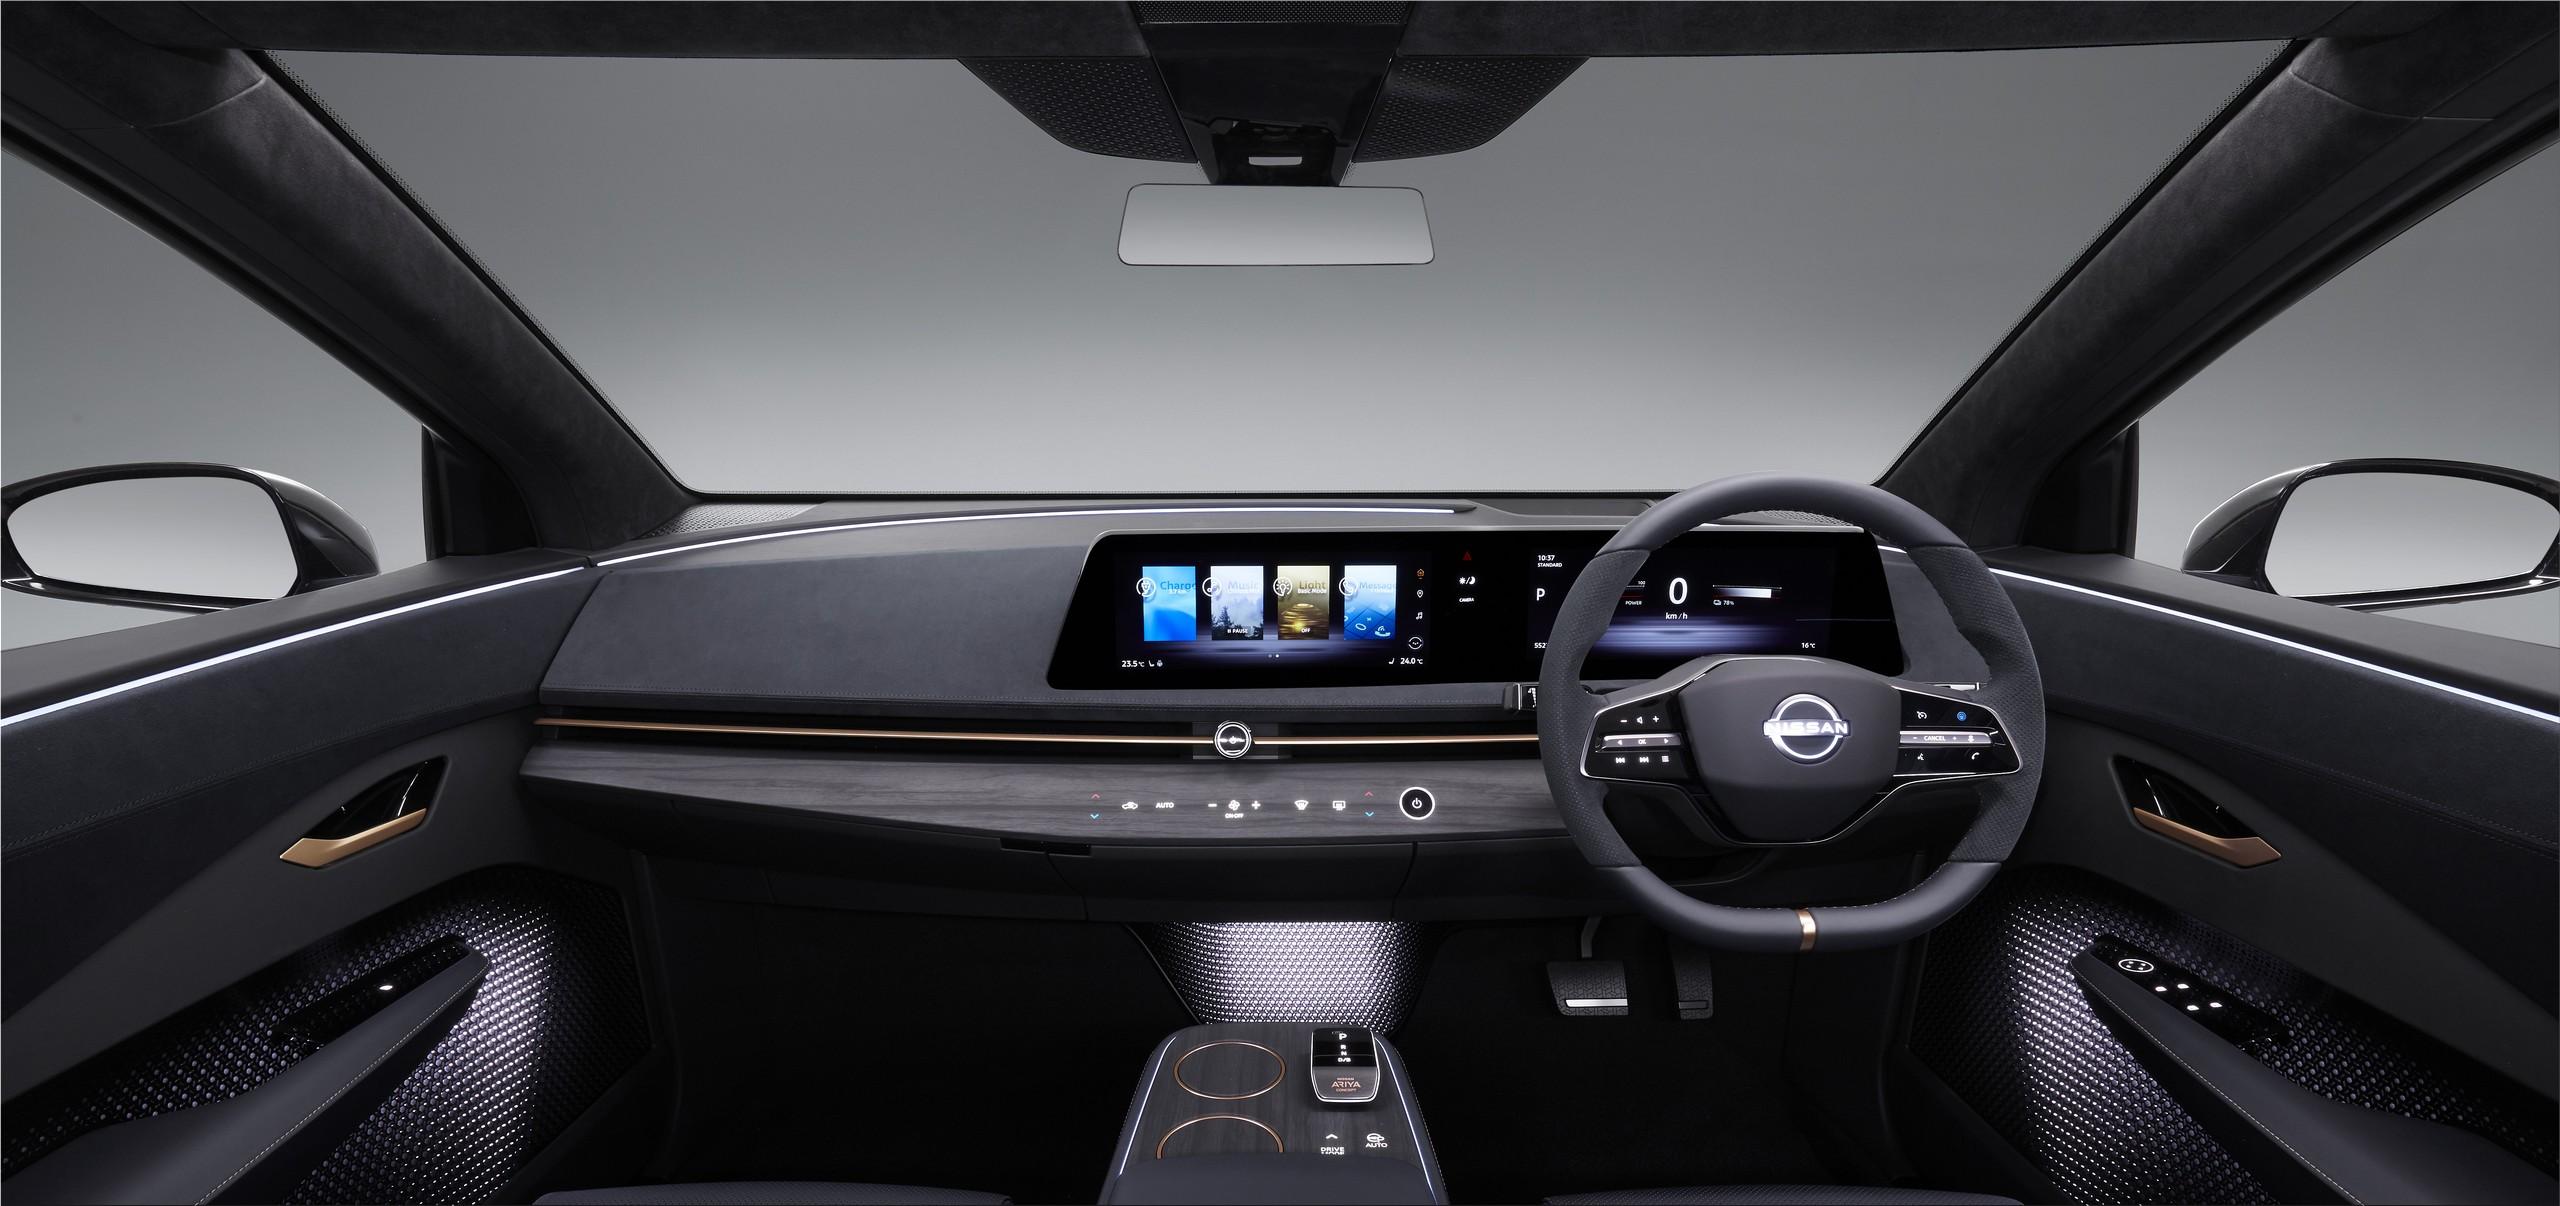 Nissan Ariya Electric Suv With Up To 500km Of Range Electric Cars Electric Hunter